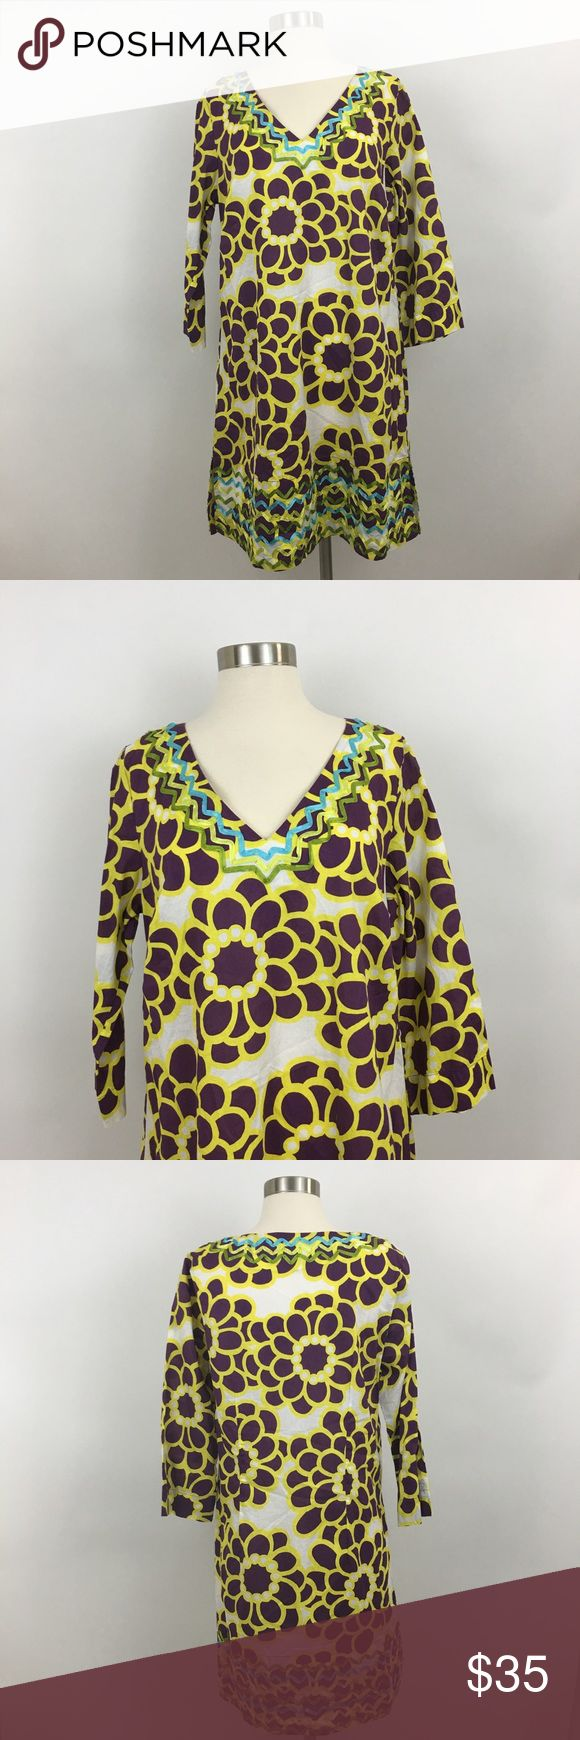 "Boden Womens Tunic Shift Dress US Size 16 Boden Womens Tunic Shift Dress US Size 16 Purple Yellow Embroidered   Measurements taken laying flat.  Bust : 20""  Length : 35""  Sleeve: 18""  Waist : 19"" Boden Dresses Mini"